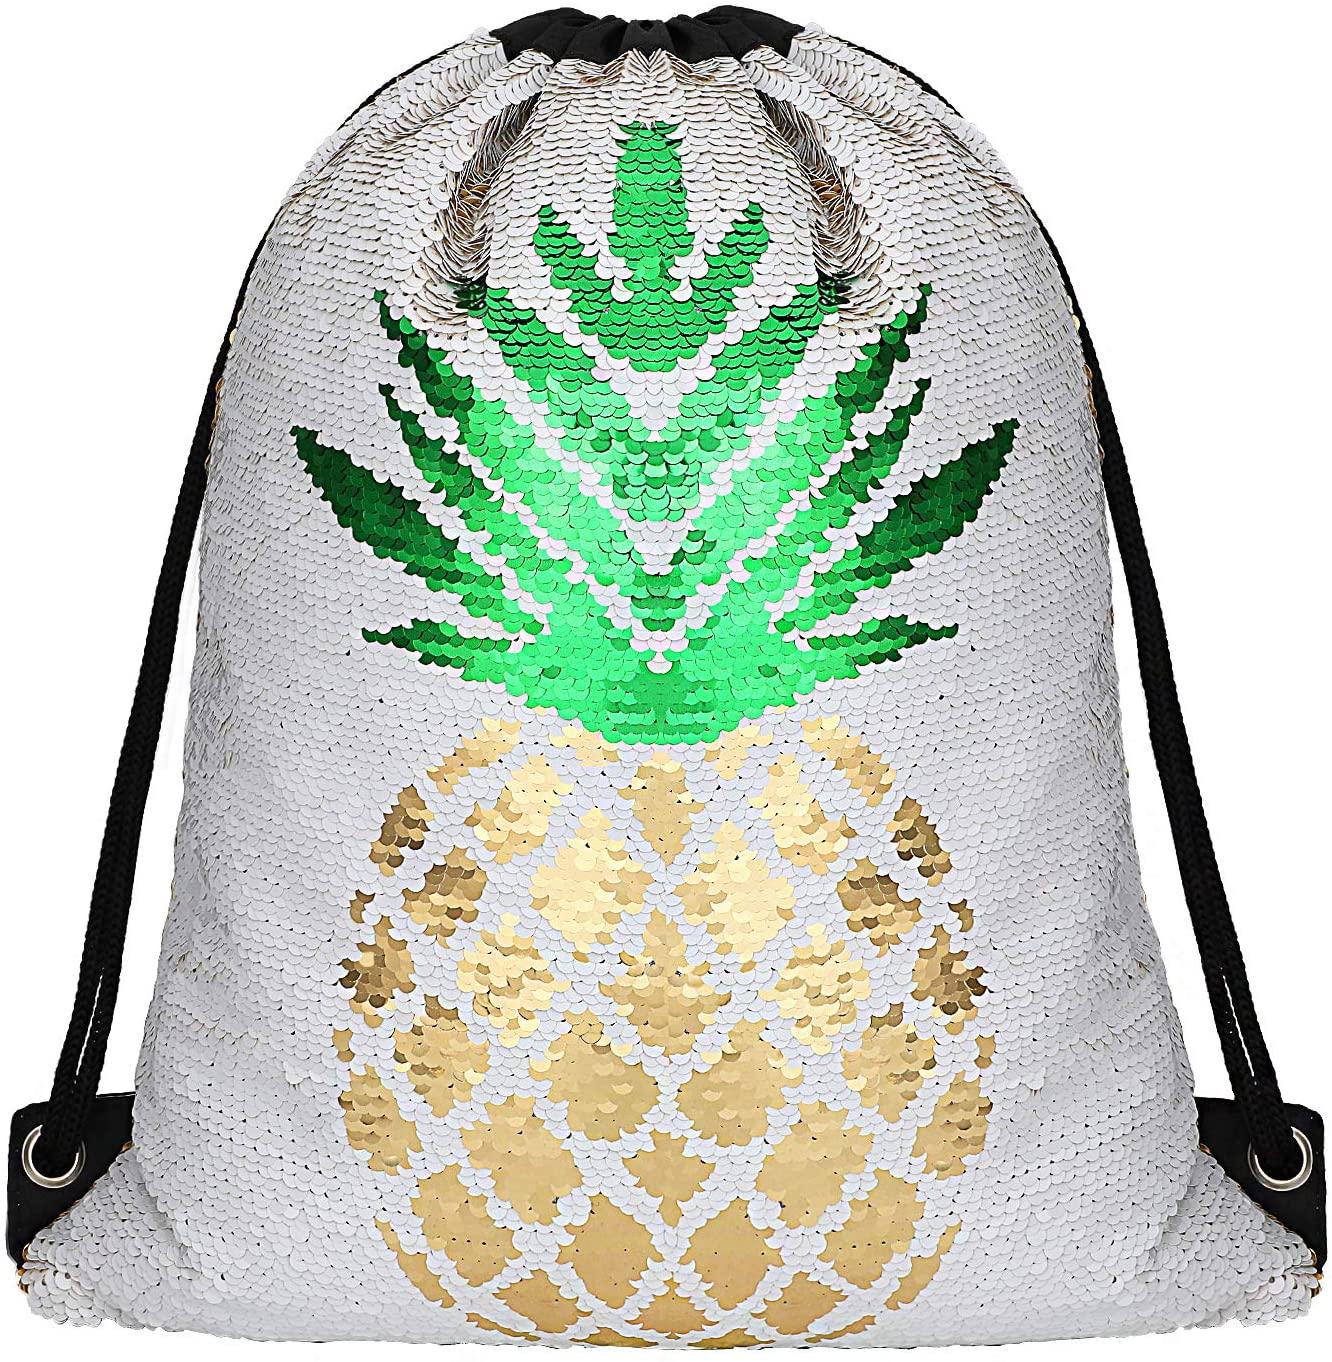 Phogary Sequin Drawstring Backpack, Dancing Reversible Mermaid Bag for Sport Outdoor Travel Beach Hiking (Gold Pineapple)